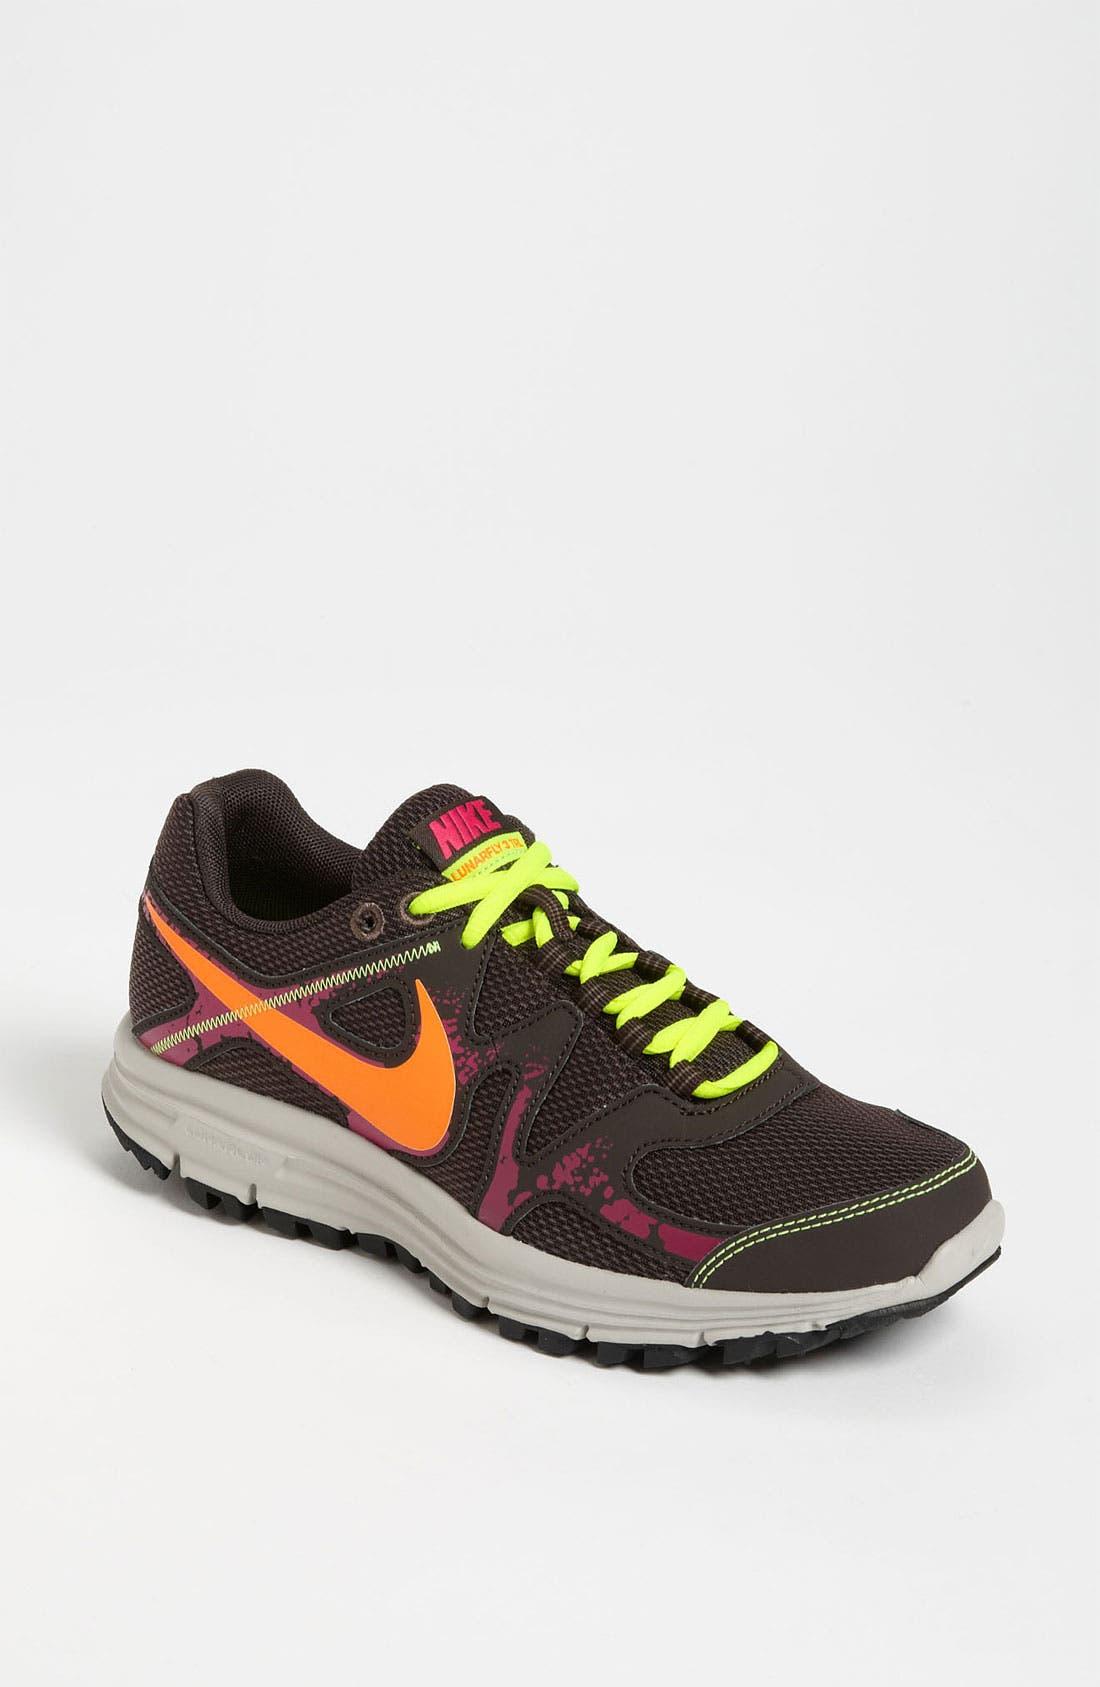 Alternate Image 1 Selected - Nike 'Lunarfly+ 3 Trail' Running Shoe (Women)